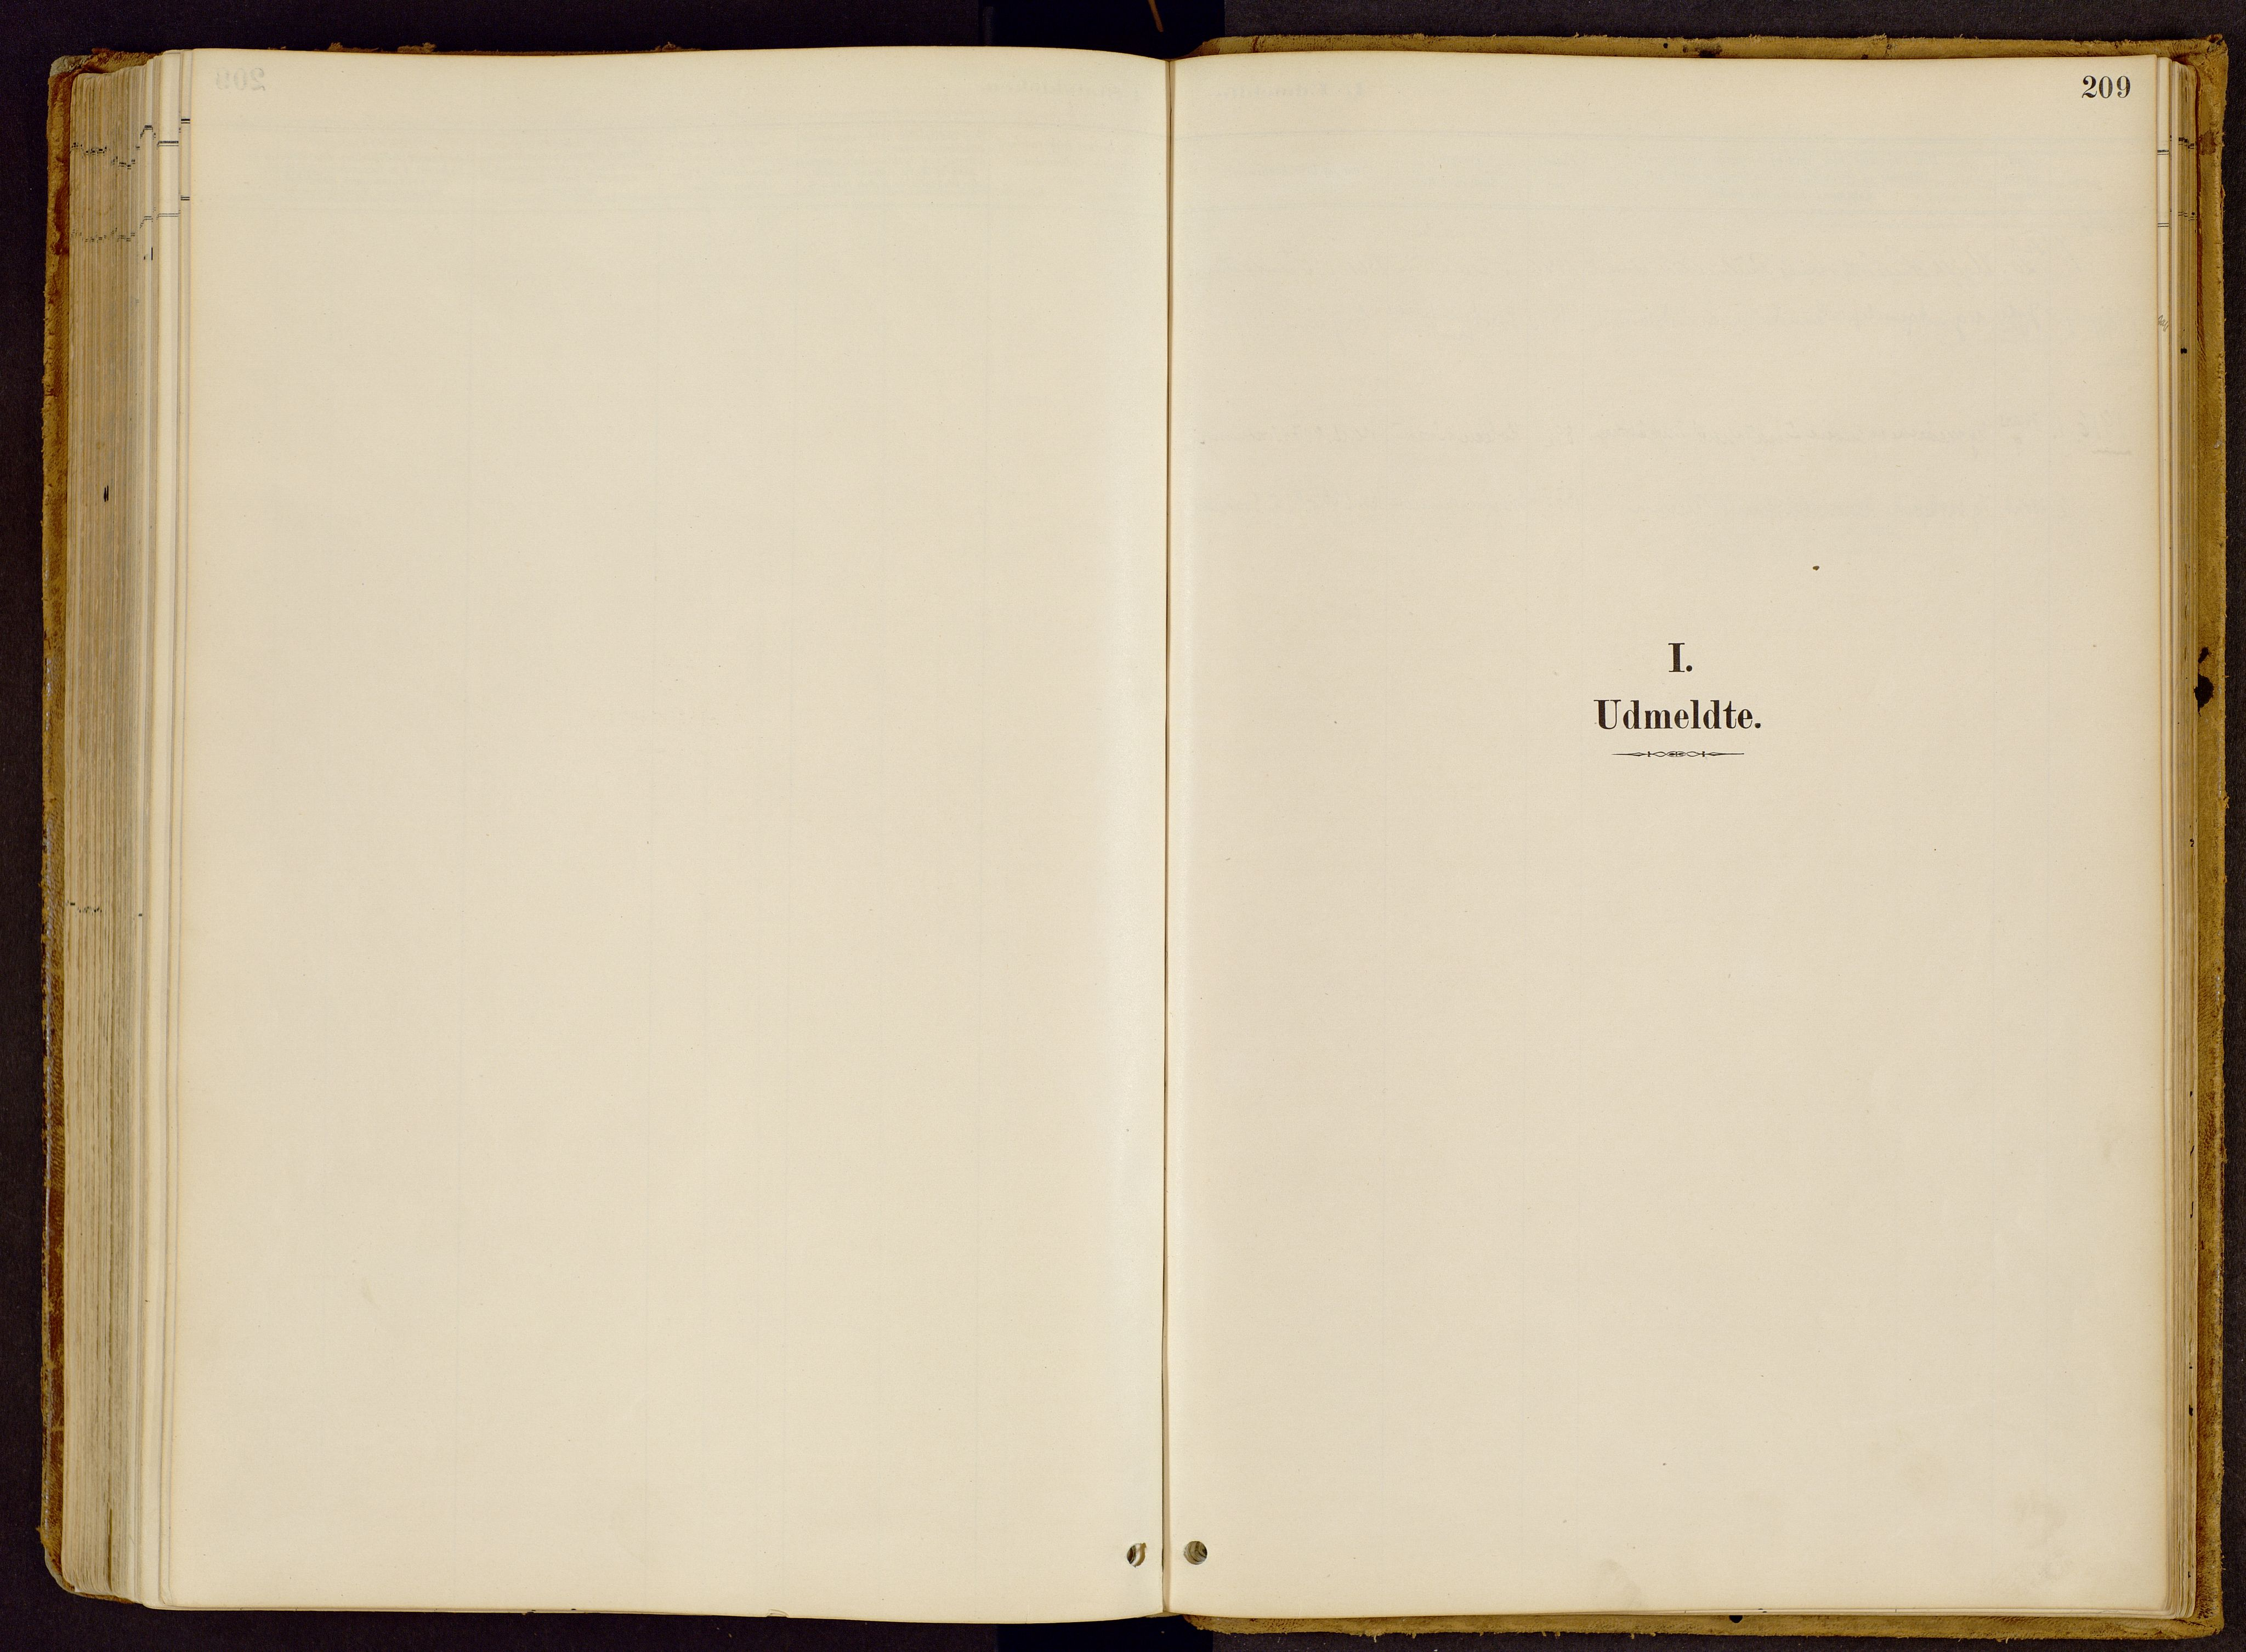 SAH, Vestre Gausdal prestekontor, Ministerialbok nr. 2, 1887-1918, s. 209